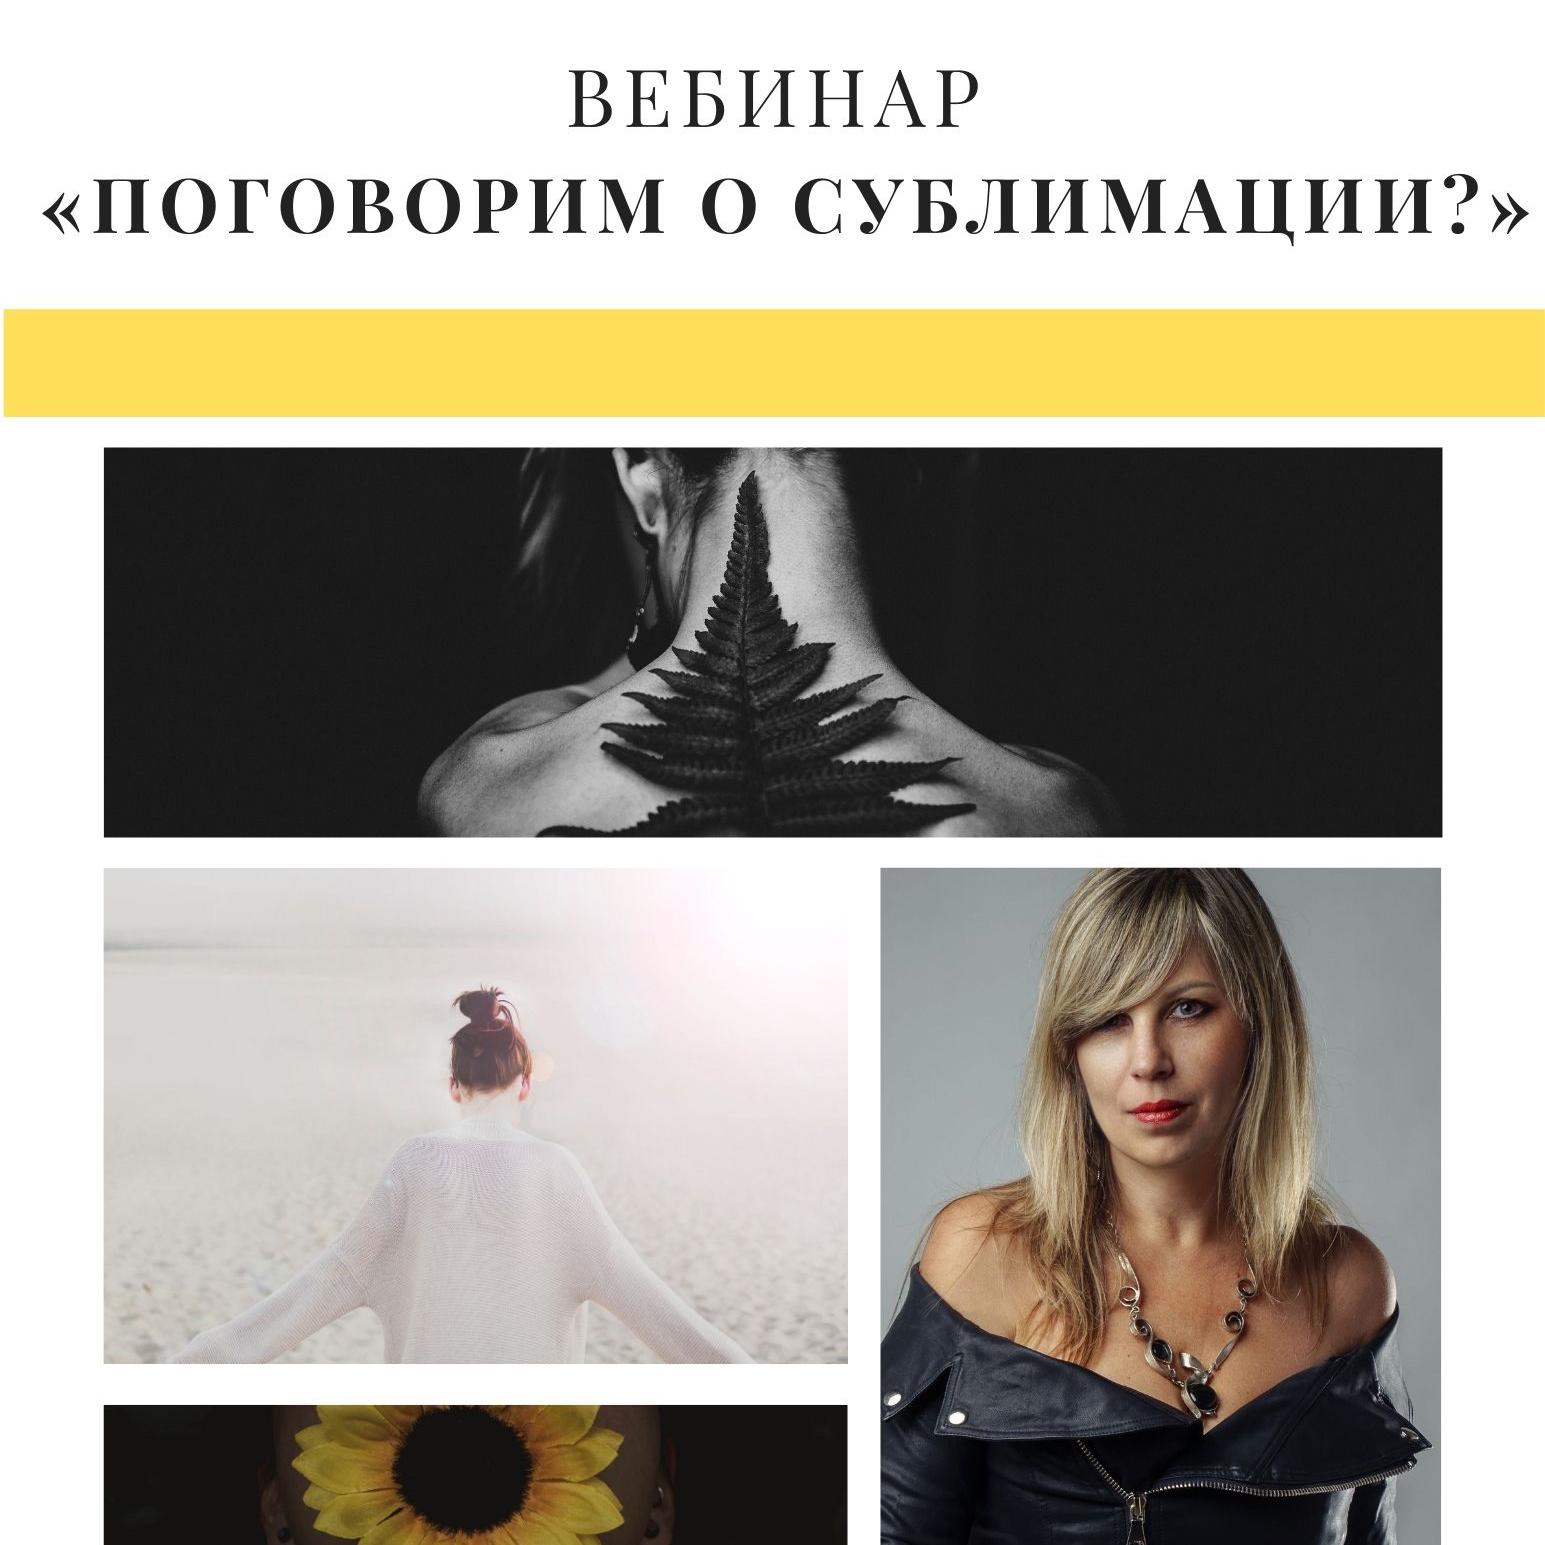 https://astrologtasha.ru/wp-content/uploads/2021/03/sub.jpg